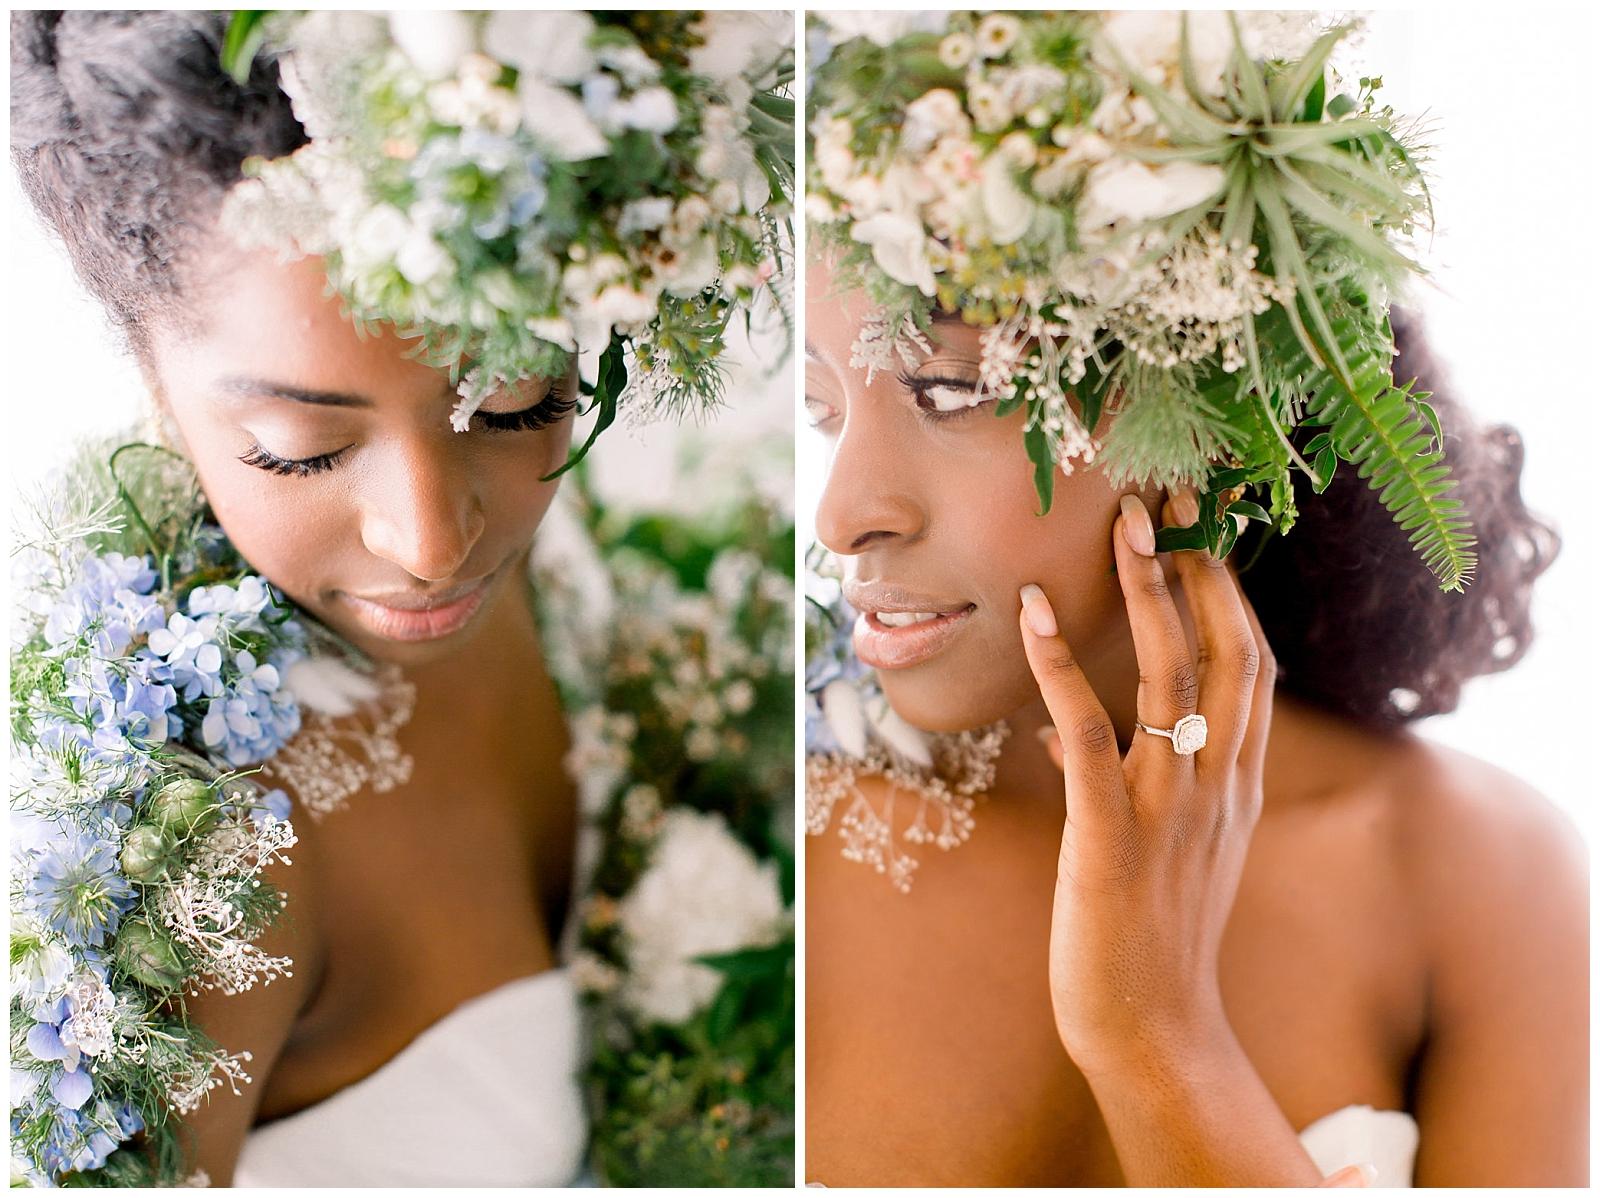 Living-Accessories-styled-shoot-de-joy-photography-epiphany-boutique-floral-bride.jpg